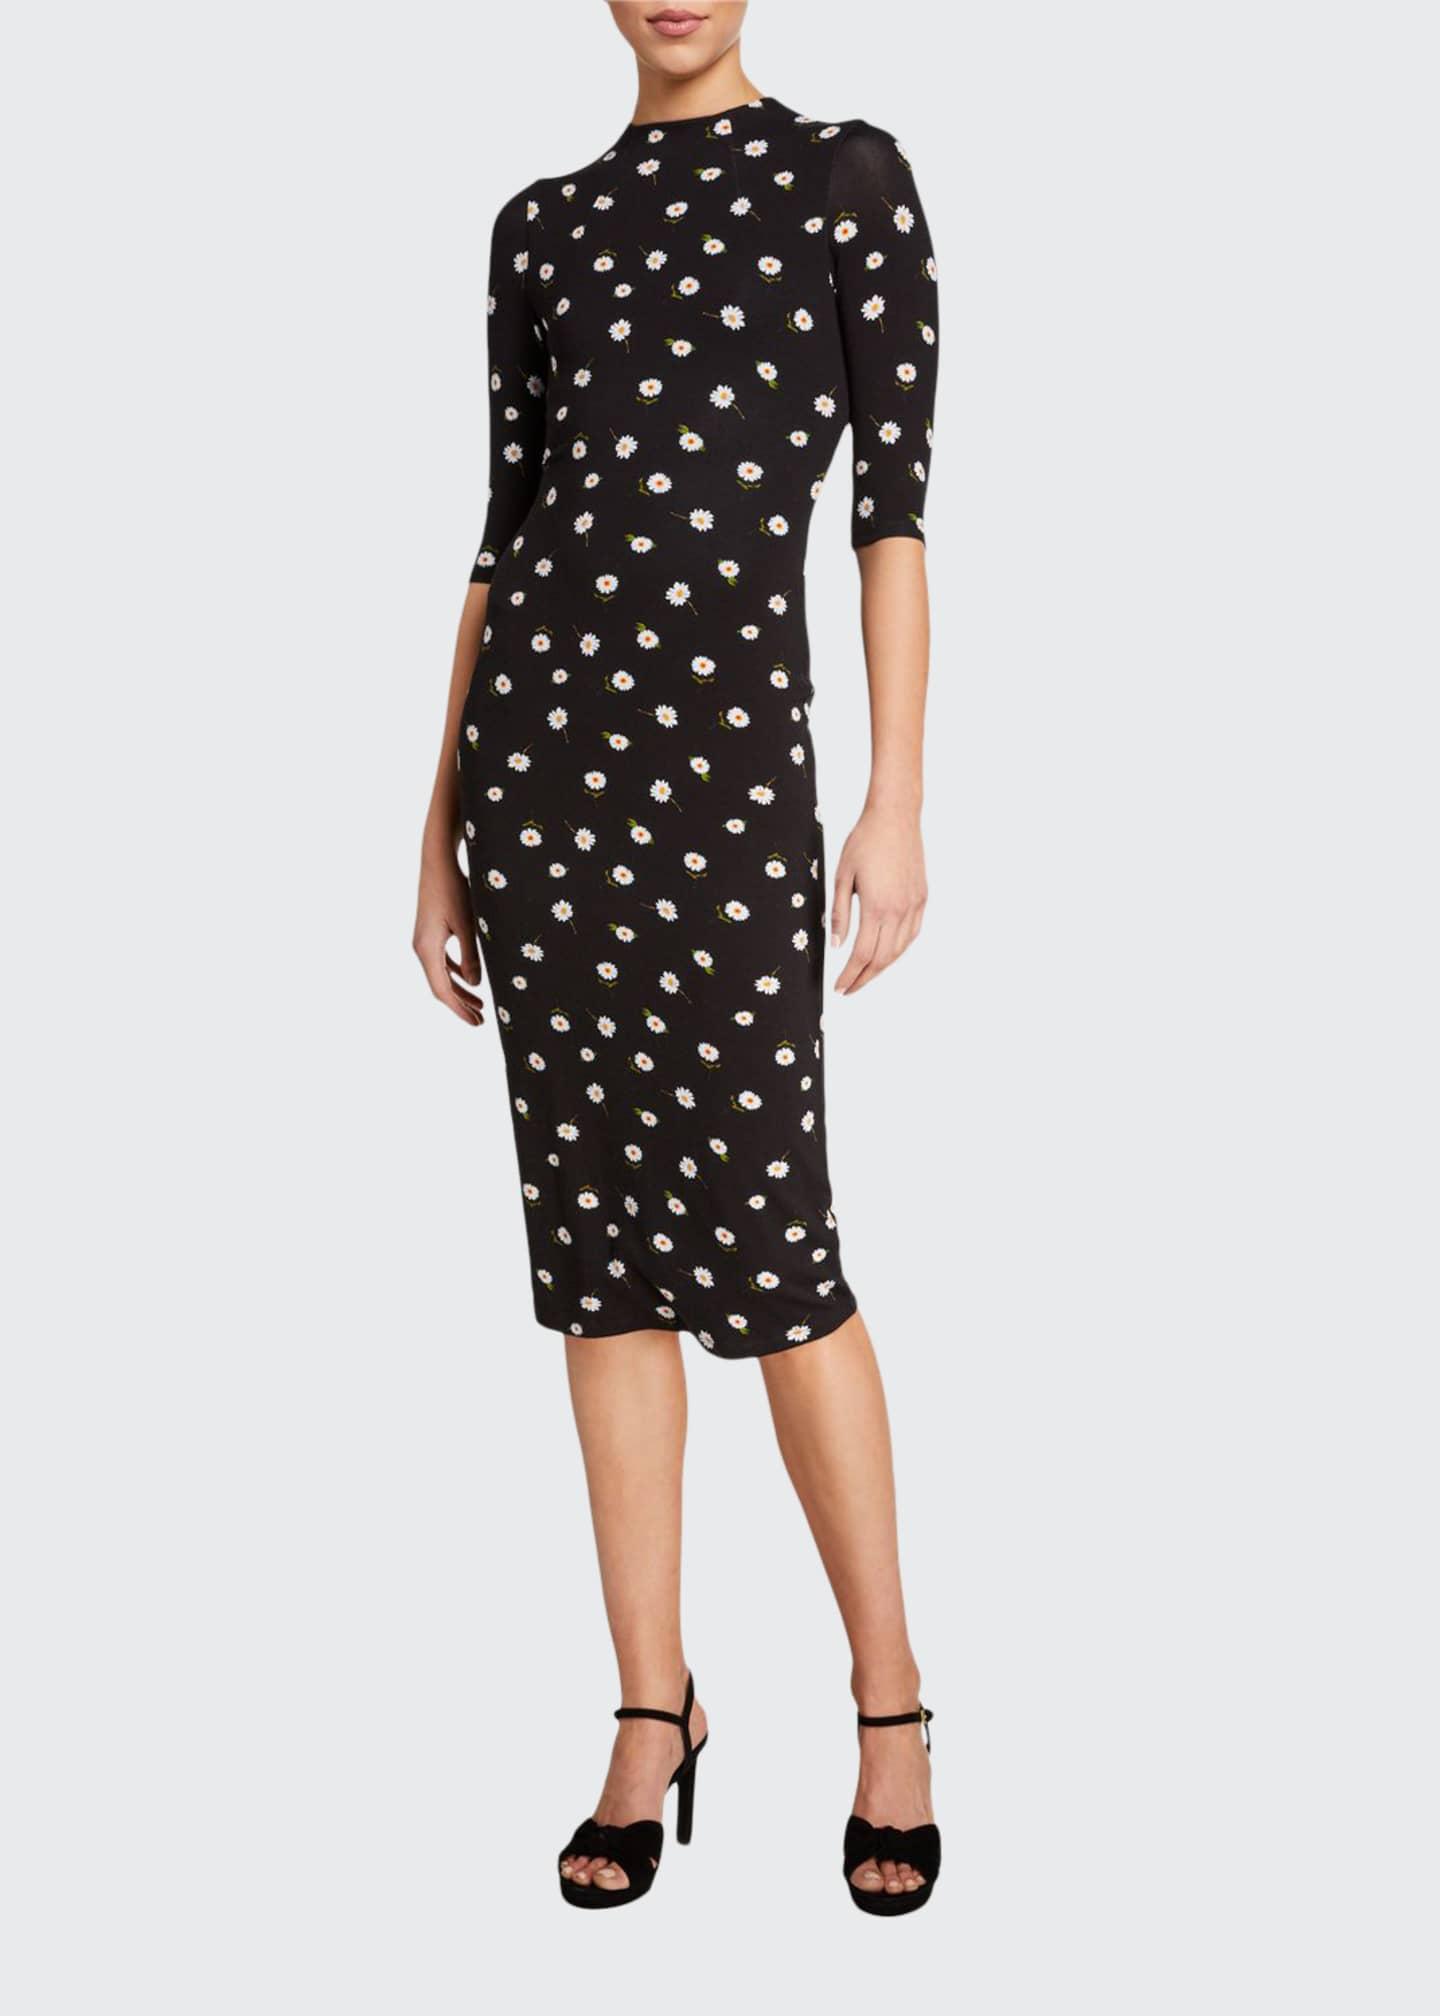 Alice + Olivia Delora Fitted Mock-Neck Dress